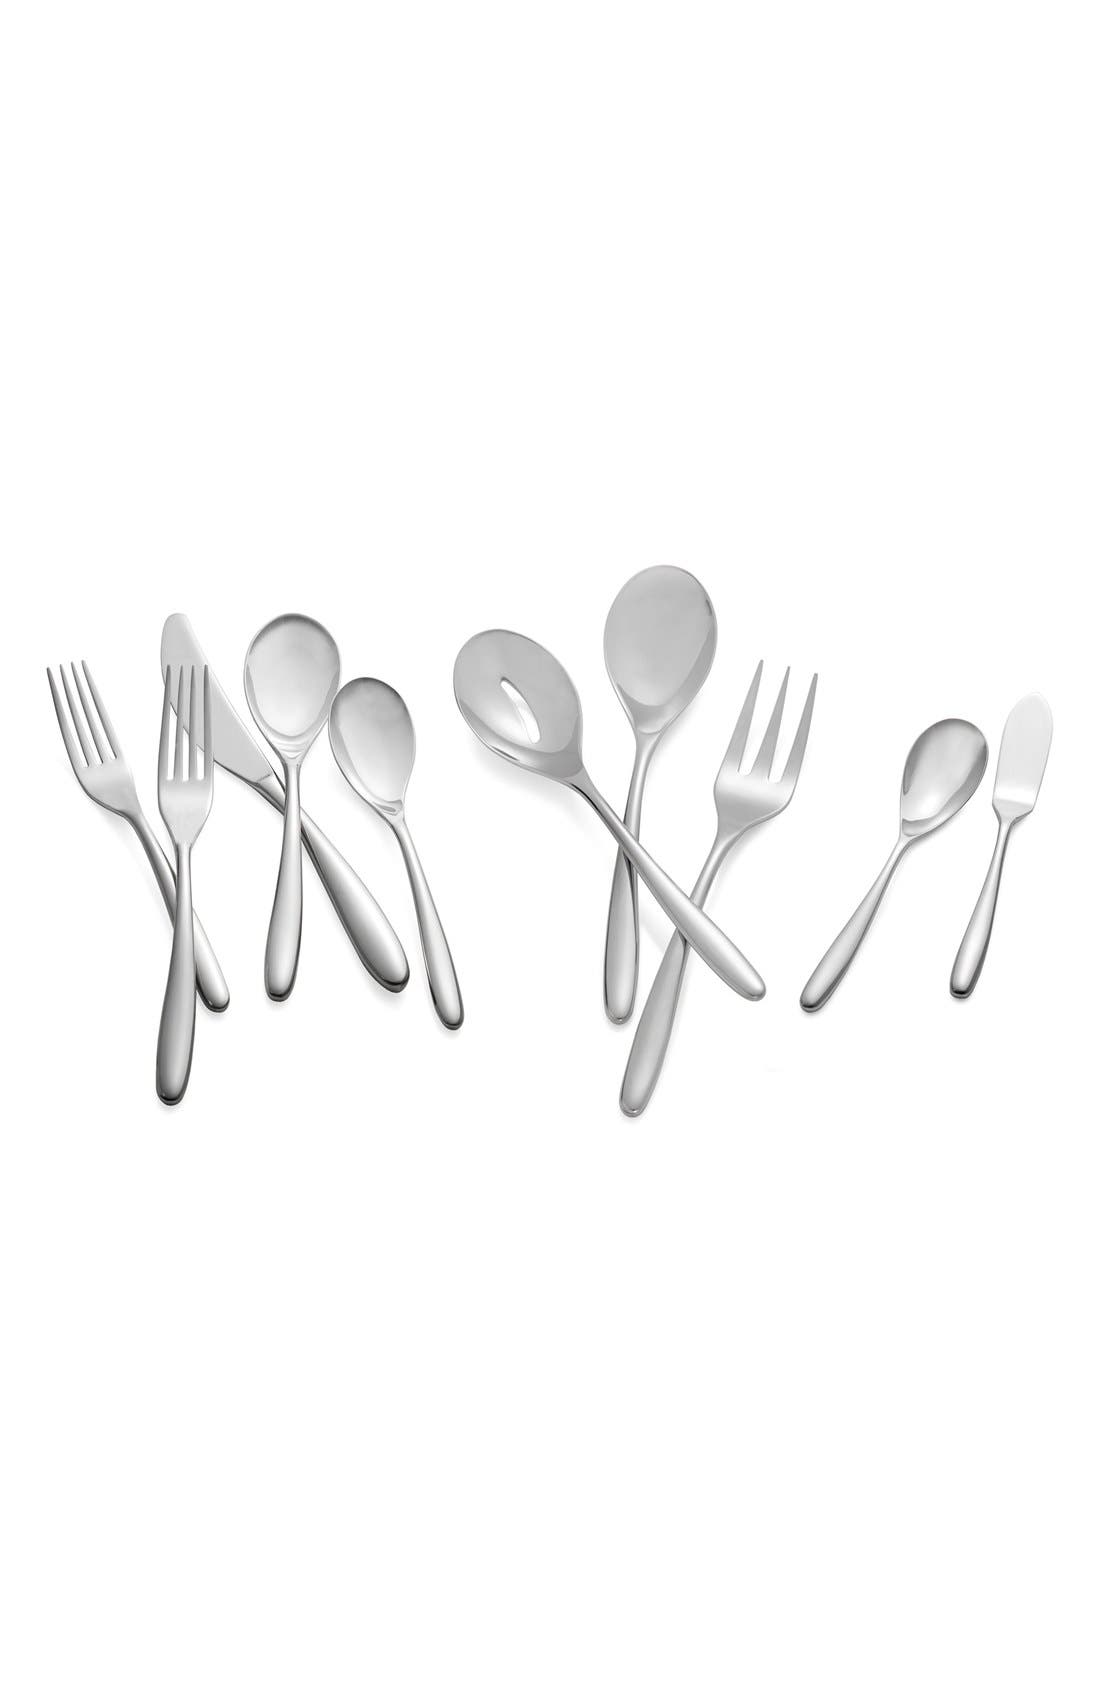 'Bend' 45-Piece Flatware Set,                         Main,                         color, Silver